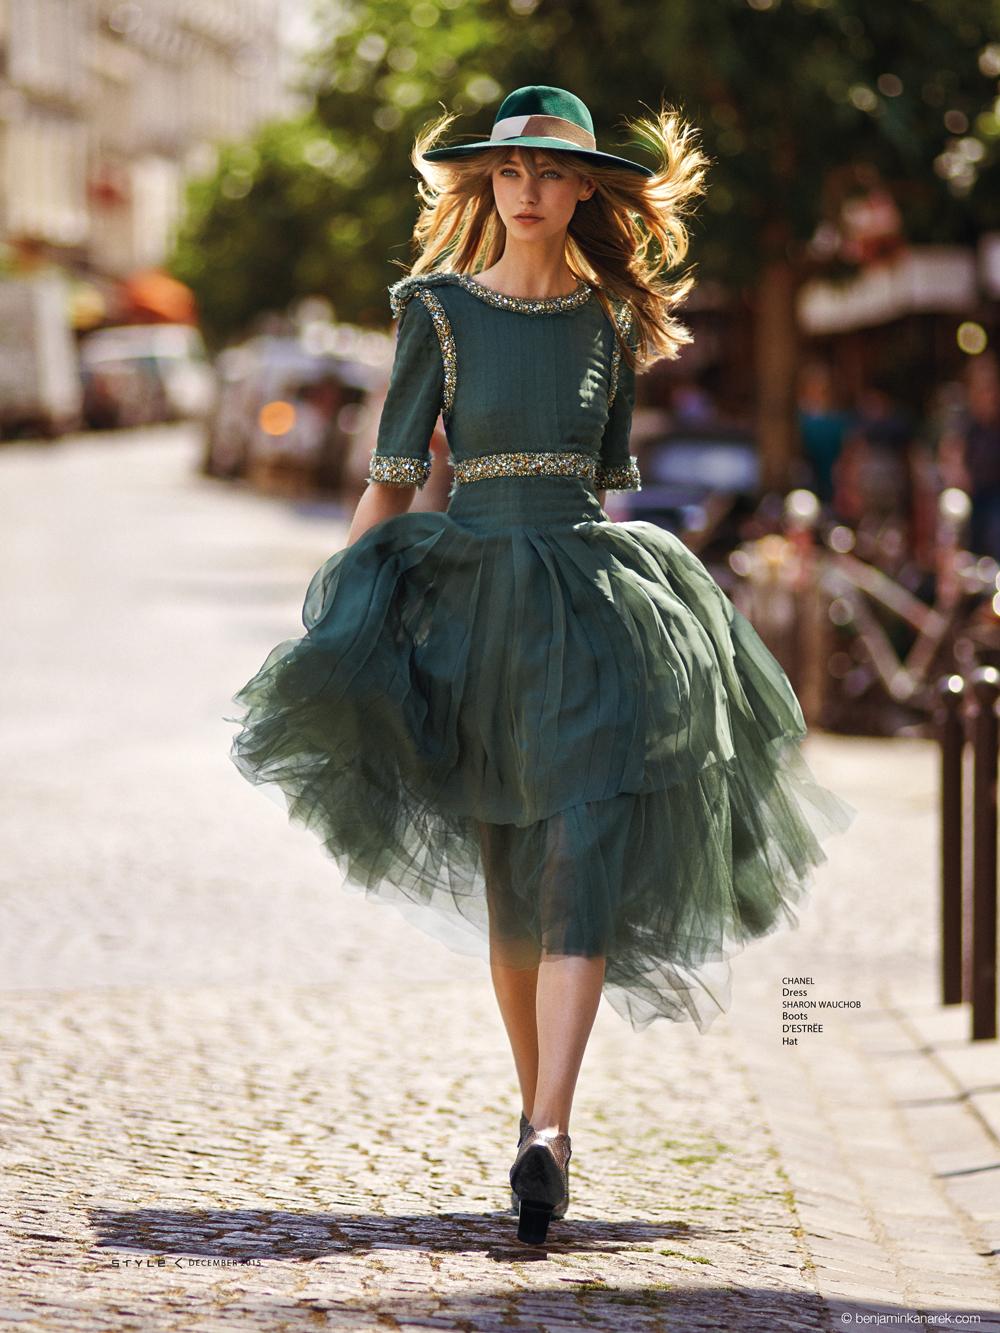 Alexandra Tikerpuu in Chanel © Benjamin Kanarek